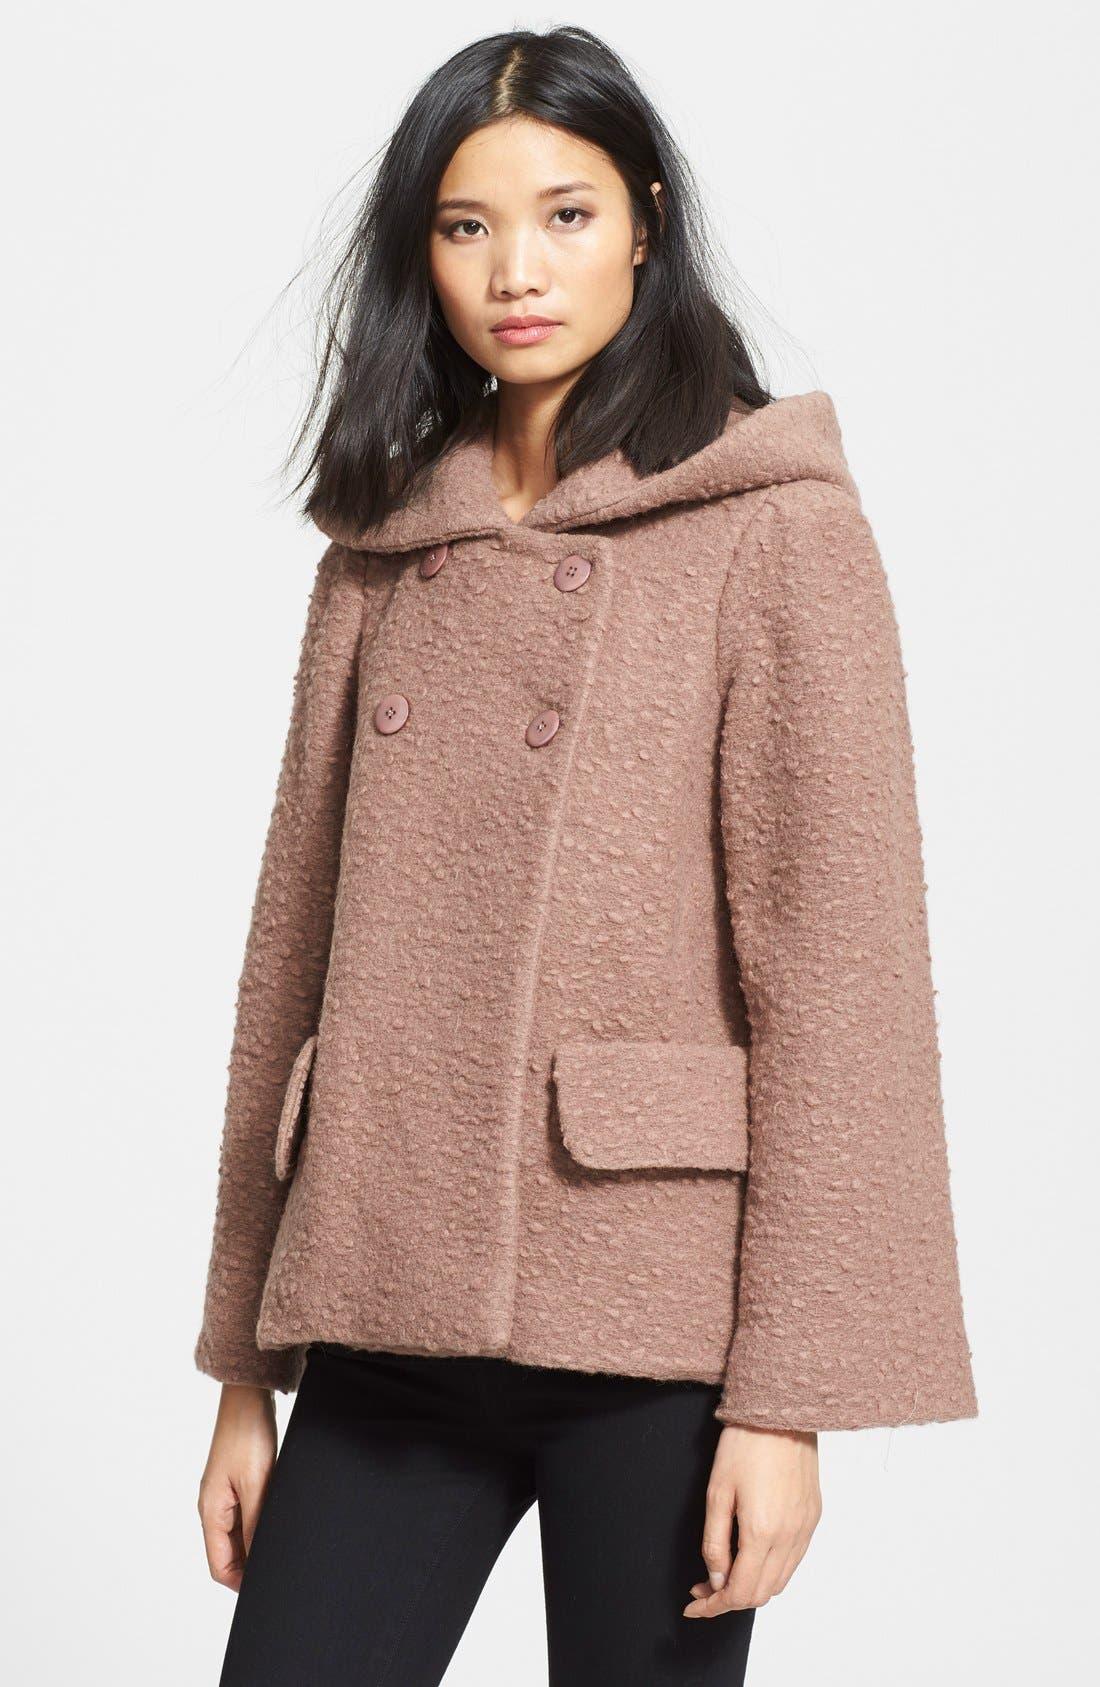 JILL STUART 'Diane' Wool Blend Short Coat, Main, color, 020